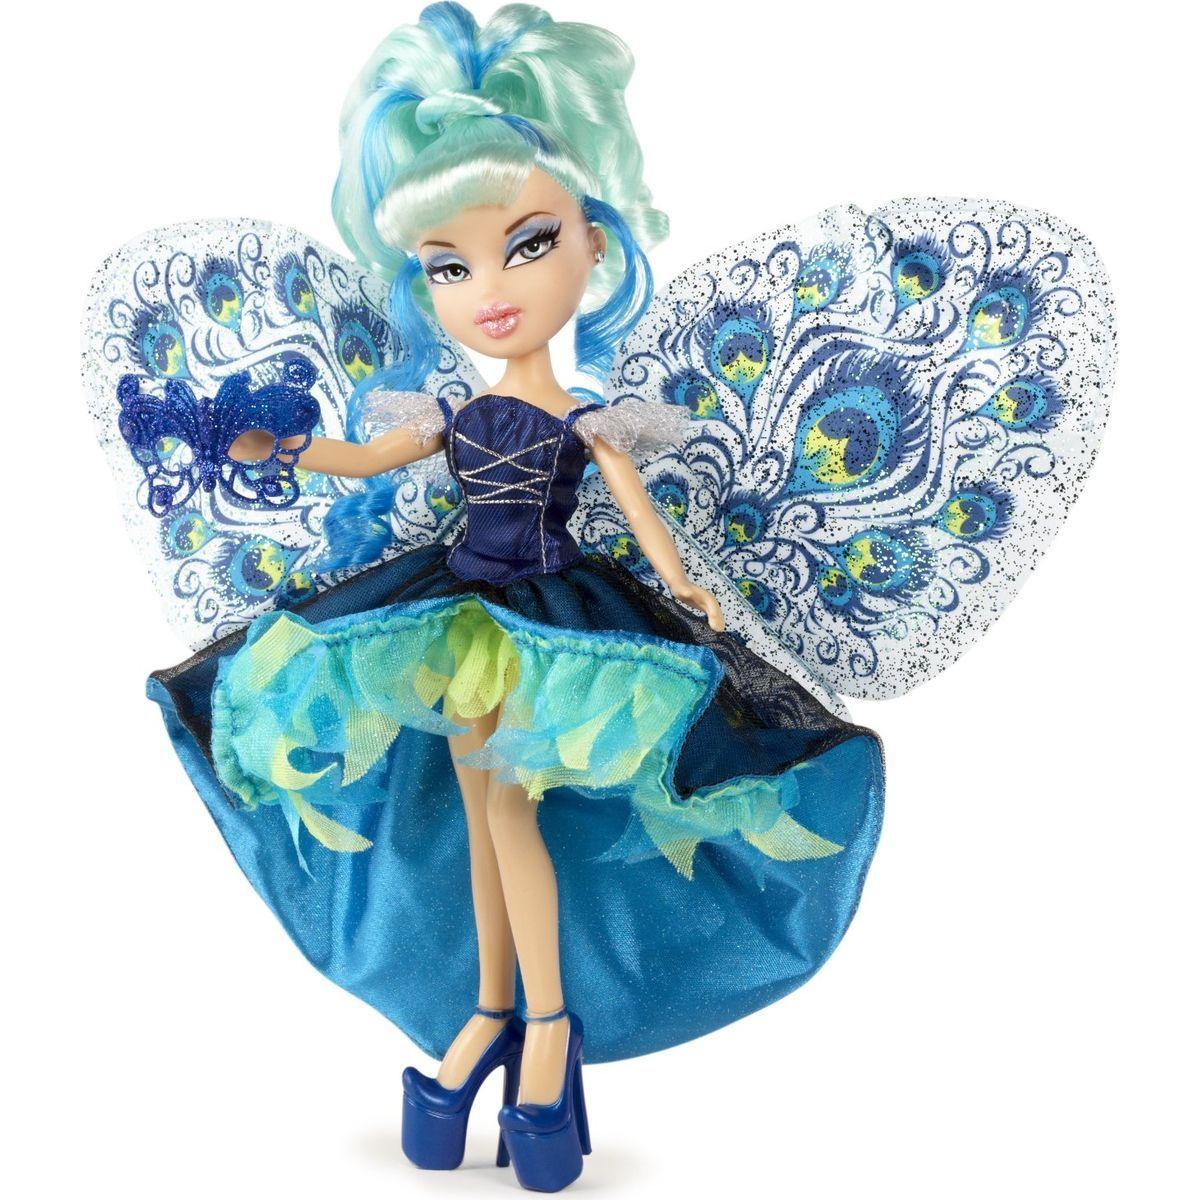 Bratz Chic Mystique víla s motýlými křídly - Jade